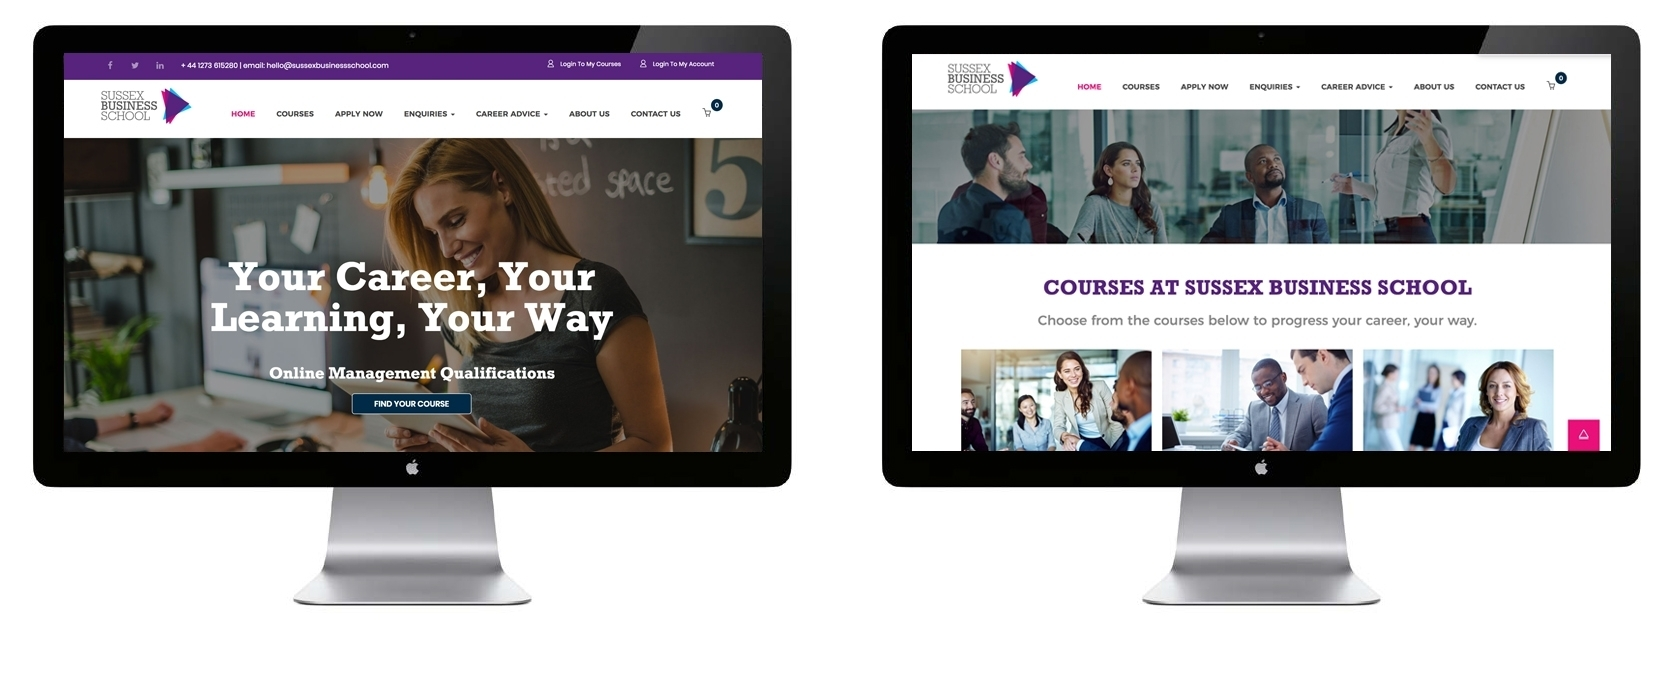 Sussex_Business_School_e-commerce-website.jpg